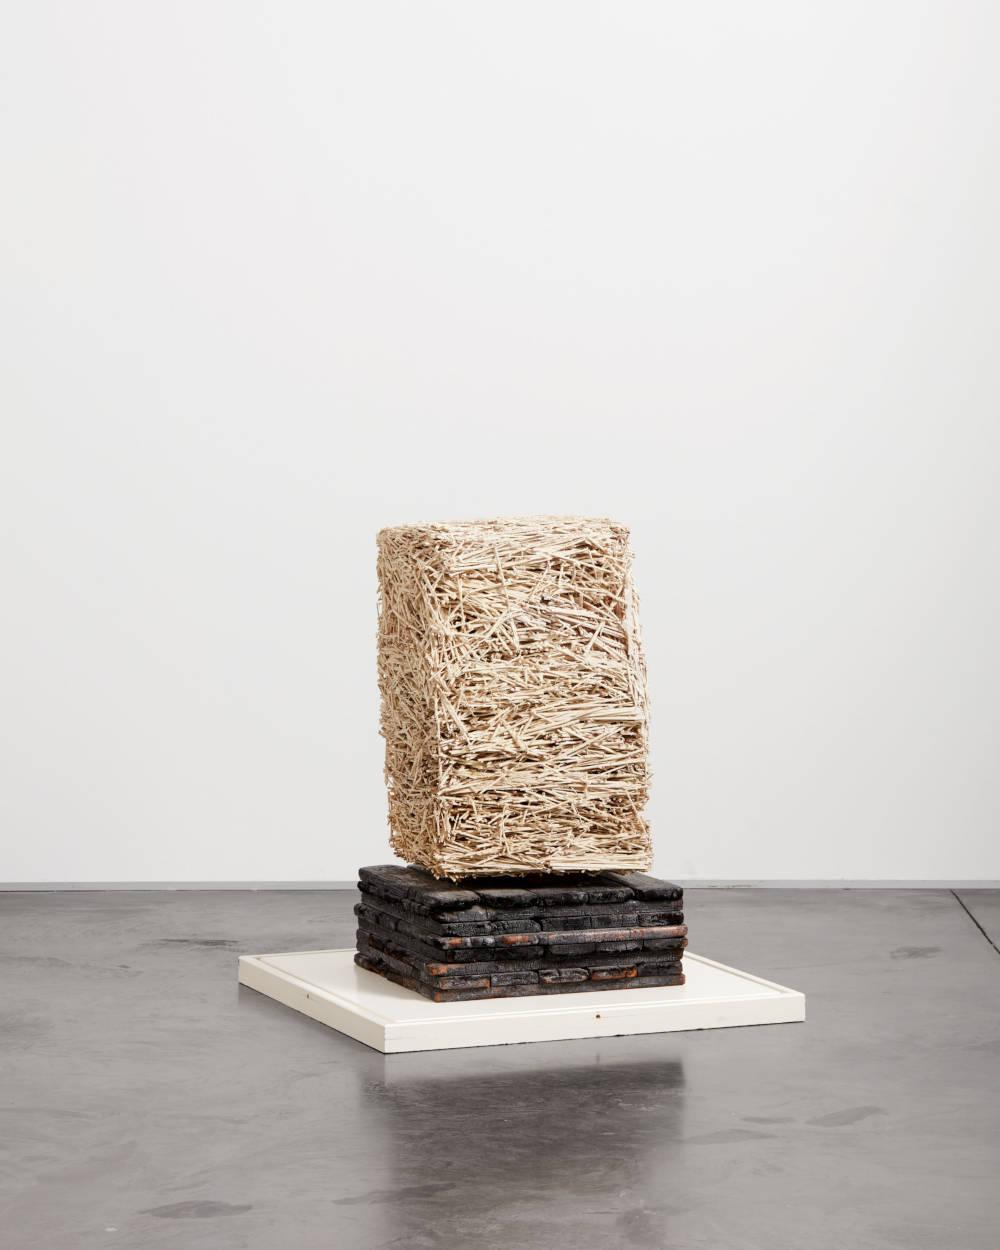 Piero Manzoni, Achrome, 1961. Straw, reflective powder and kaolin, burnt wooden base 68.3 x 45.8 x 44.5 cm / 26 7/8 x 18 x 17 1/2 in. Herning Museum of Contemporary Art (HEART) Photo: Søren Krogh © Fondazione Piero Manzoni, Milan